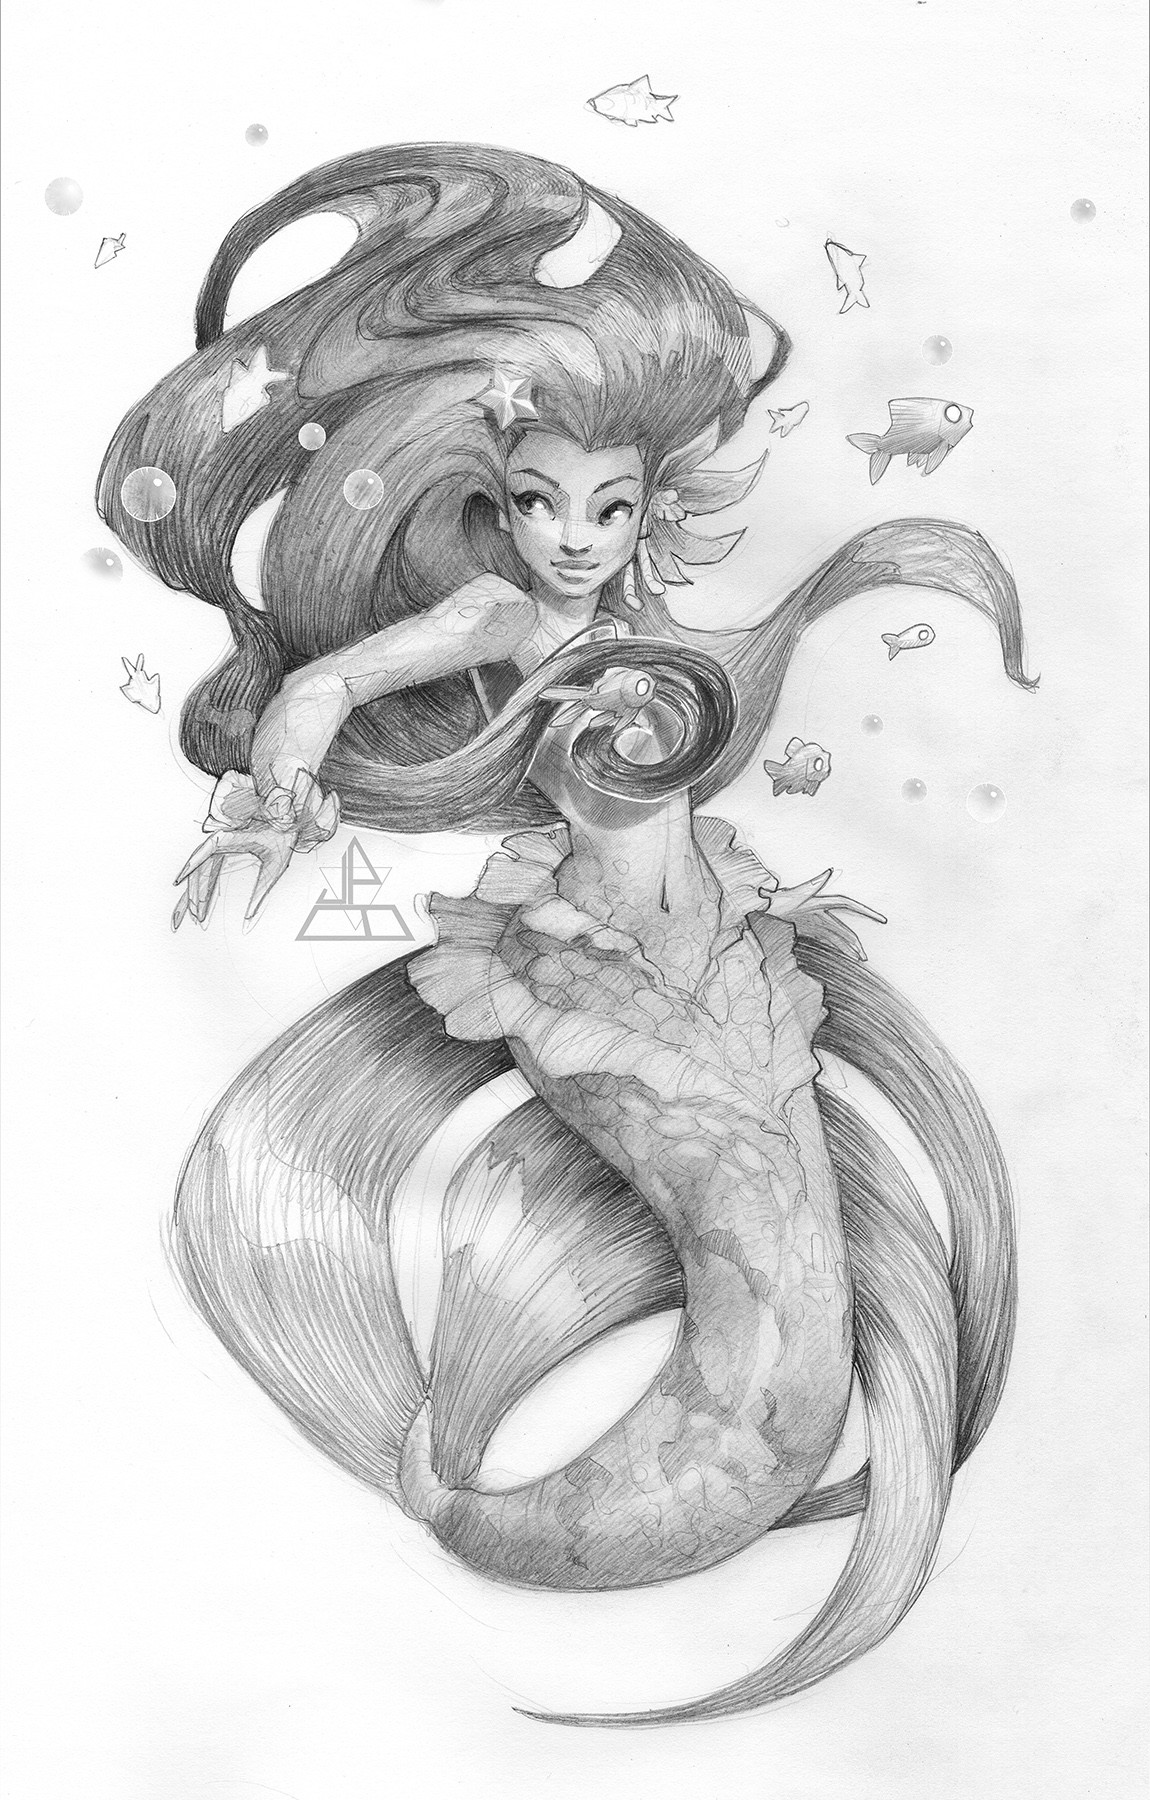 James brouwer mermaid02